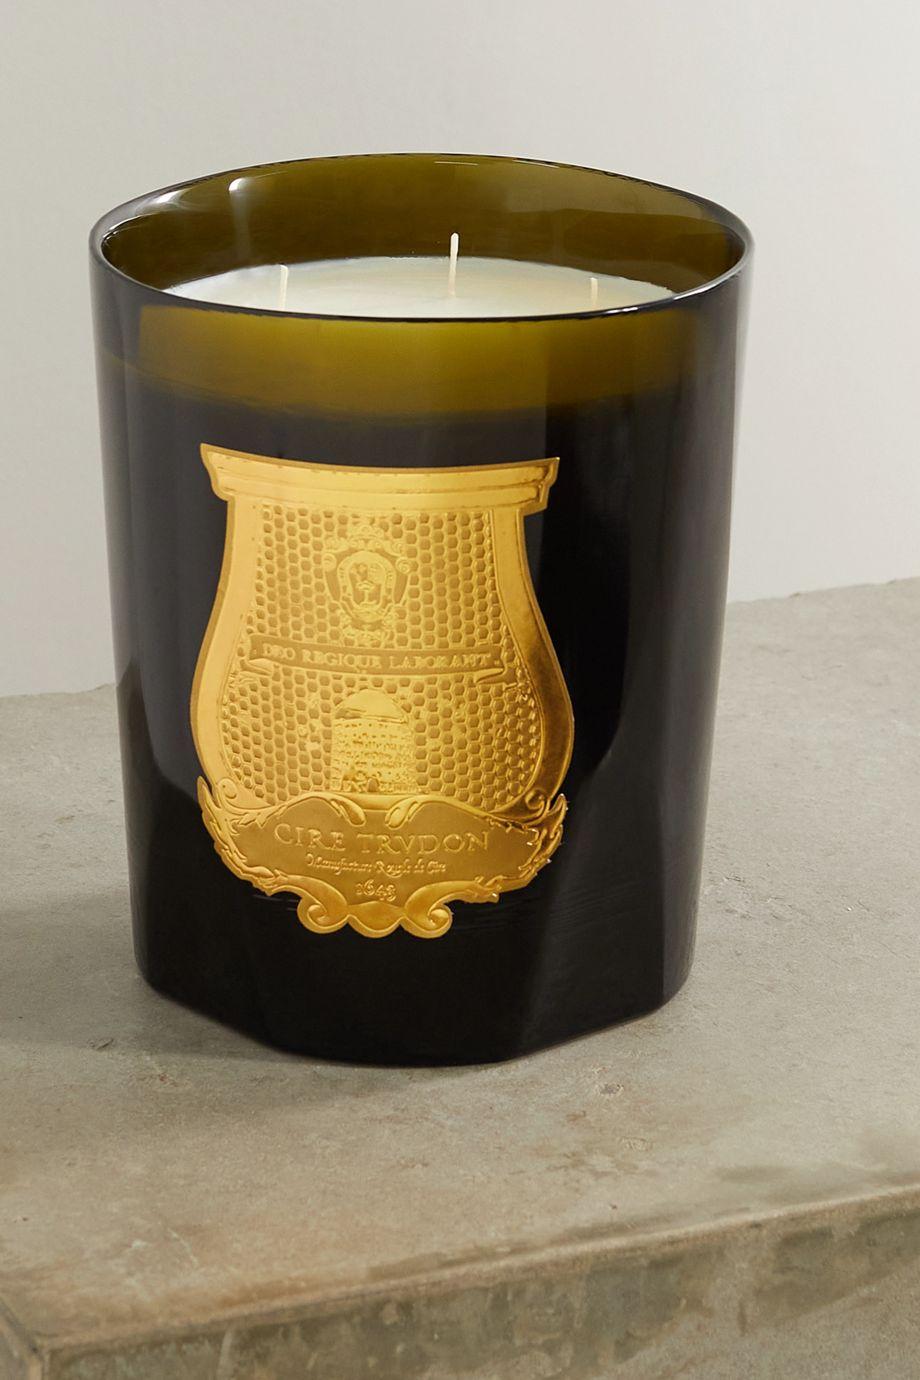 Cire Trudon Abd el Kader scented candle, 3kg